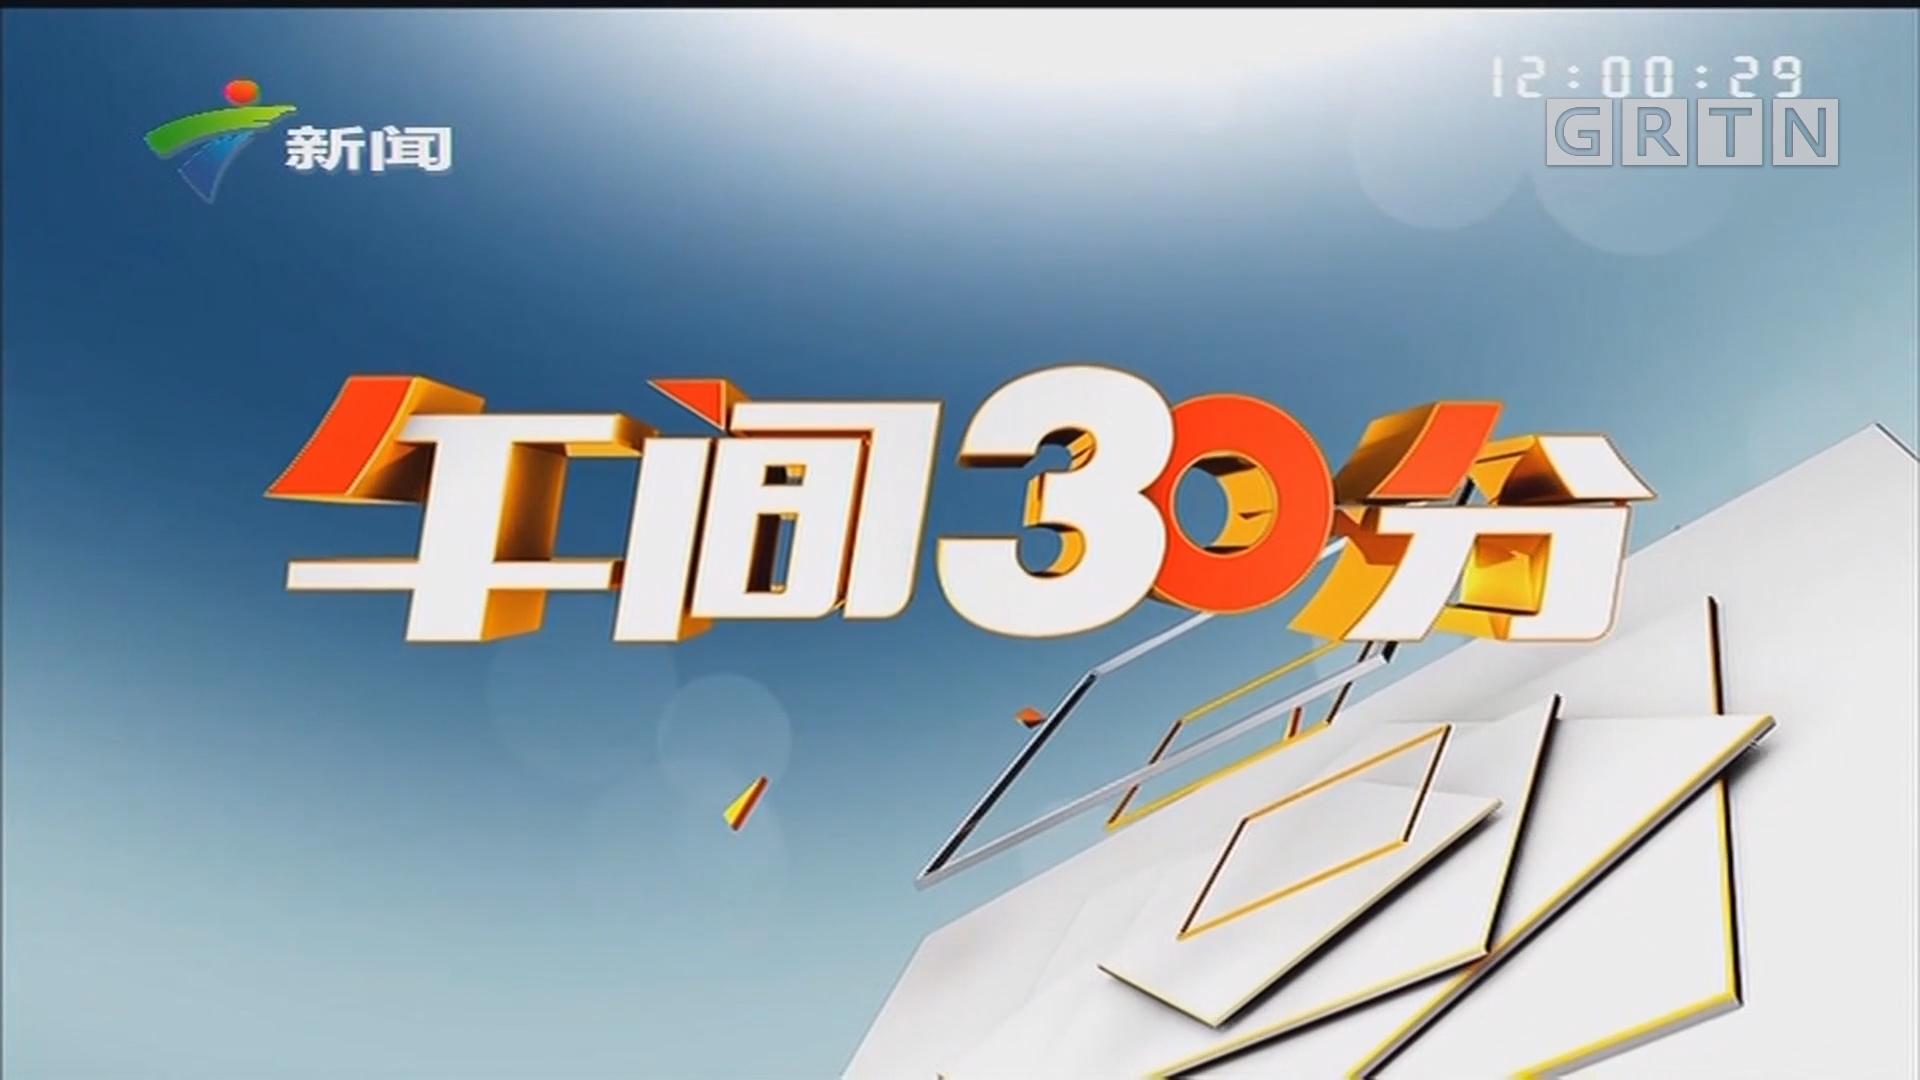 [HD][2019-12-09]正午30分:佛山高明山火:外线明火基本扑灭 火灾形势得到有效控制